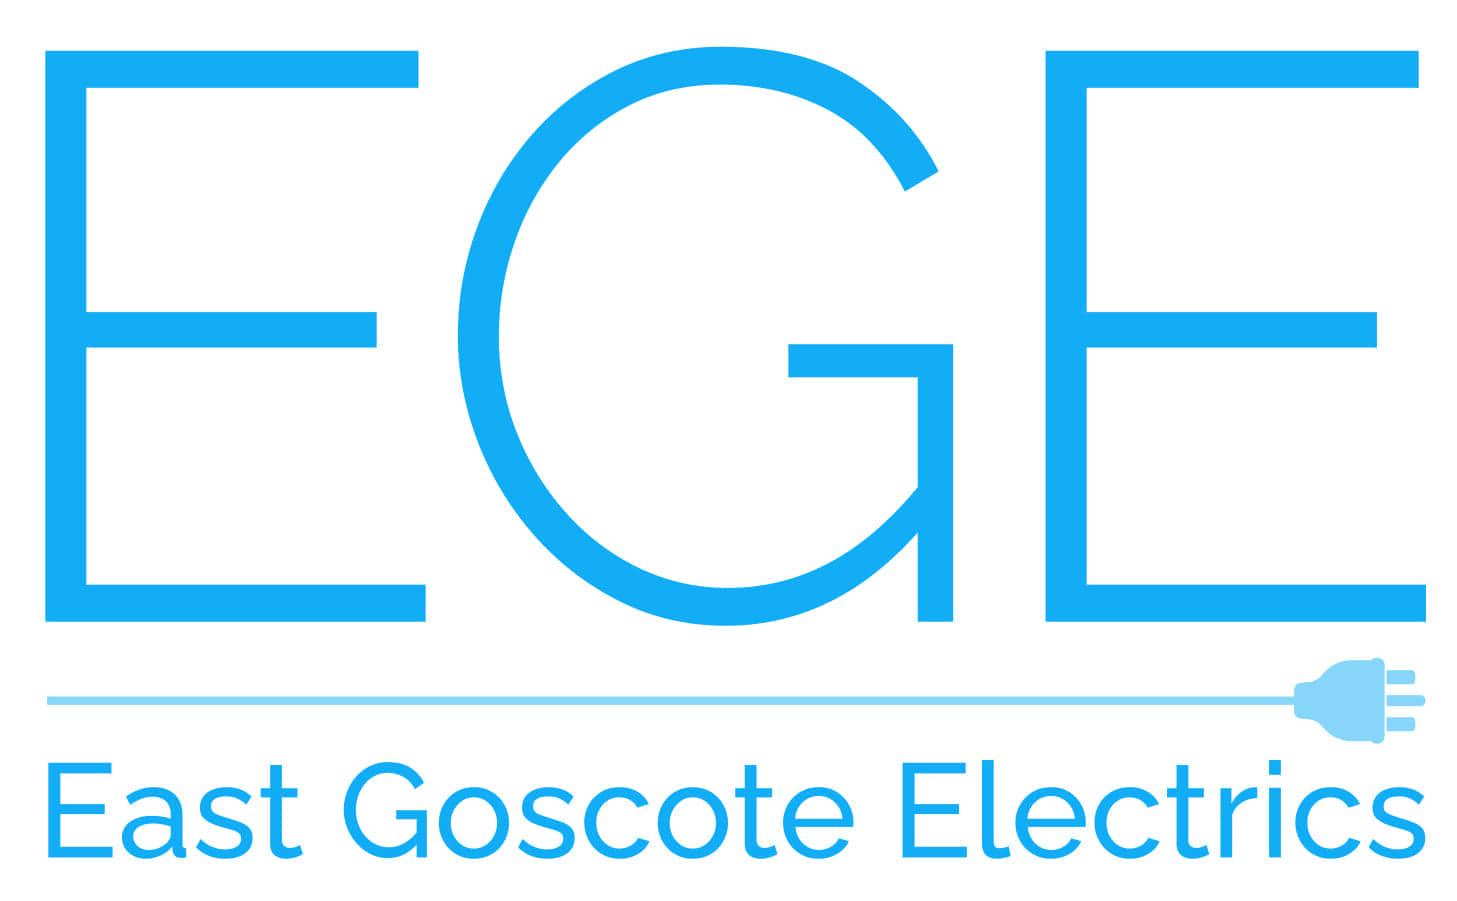 East Goscote Electrics